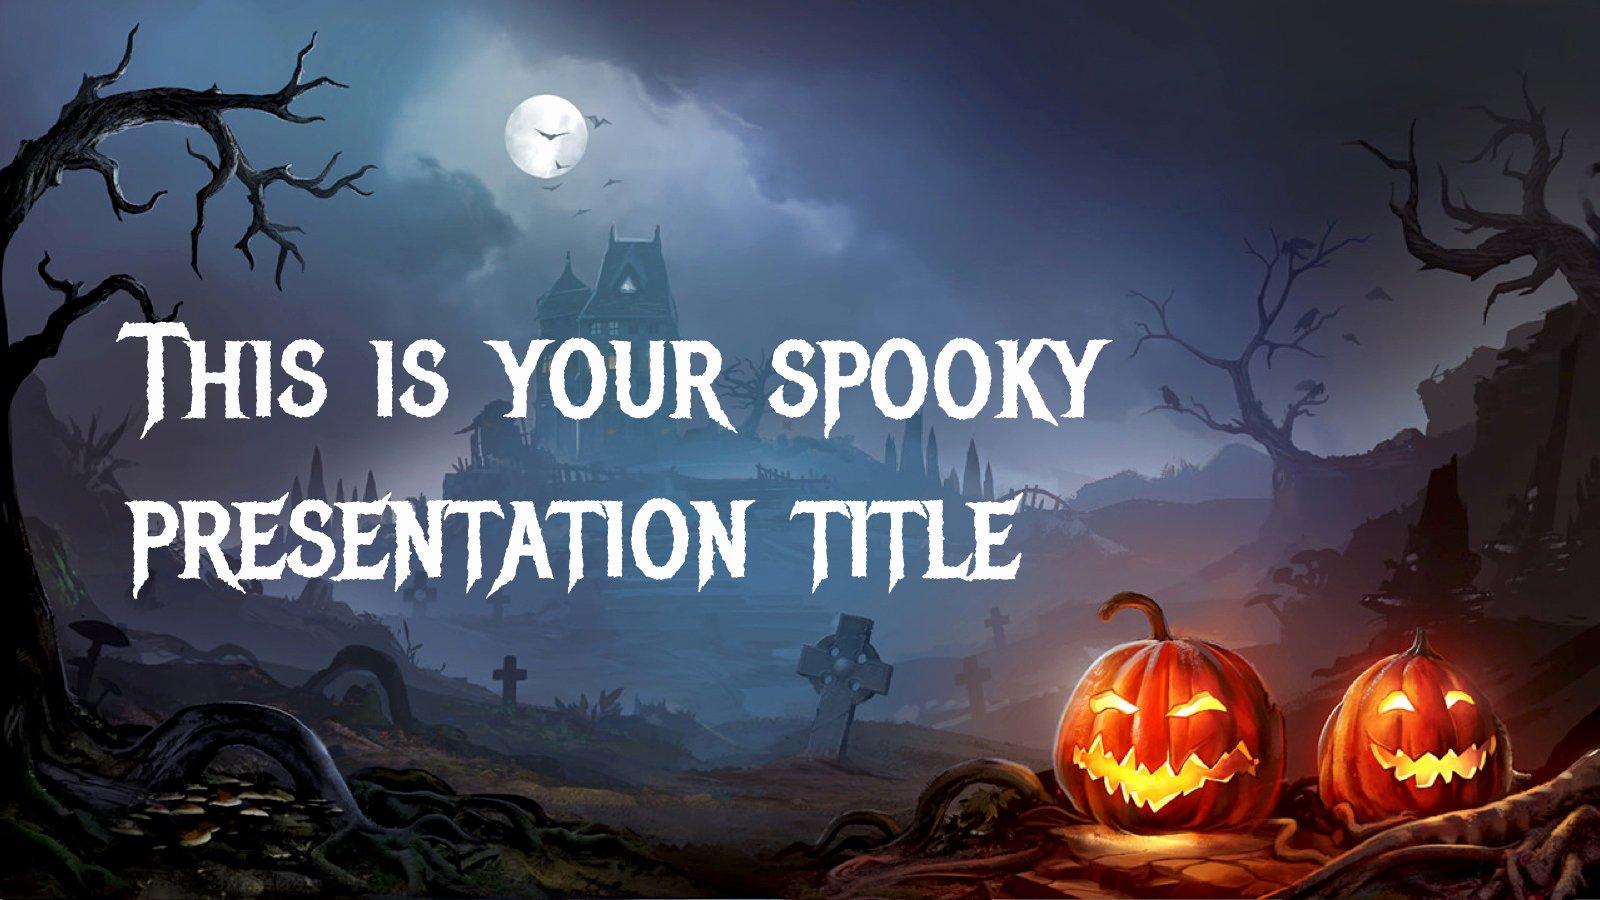 Free Halloween Powerpoint Templates Beautiful Halloween 2017 Free Powerpoint Template & Google Slides theme Freebie Supply